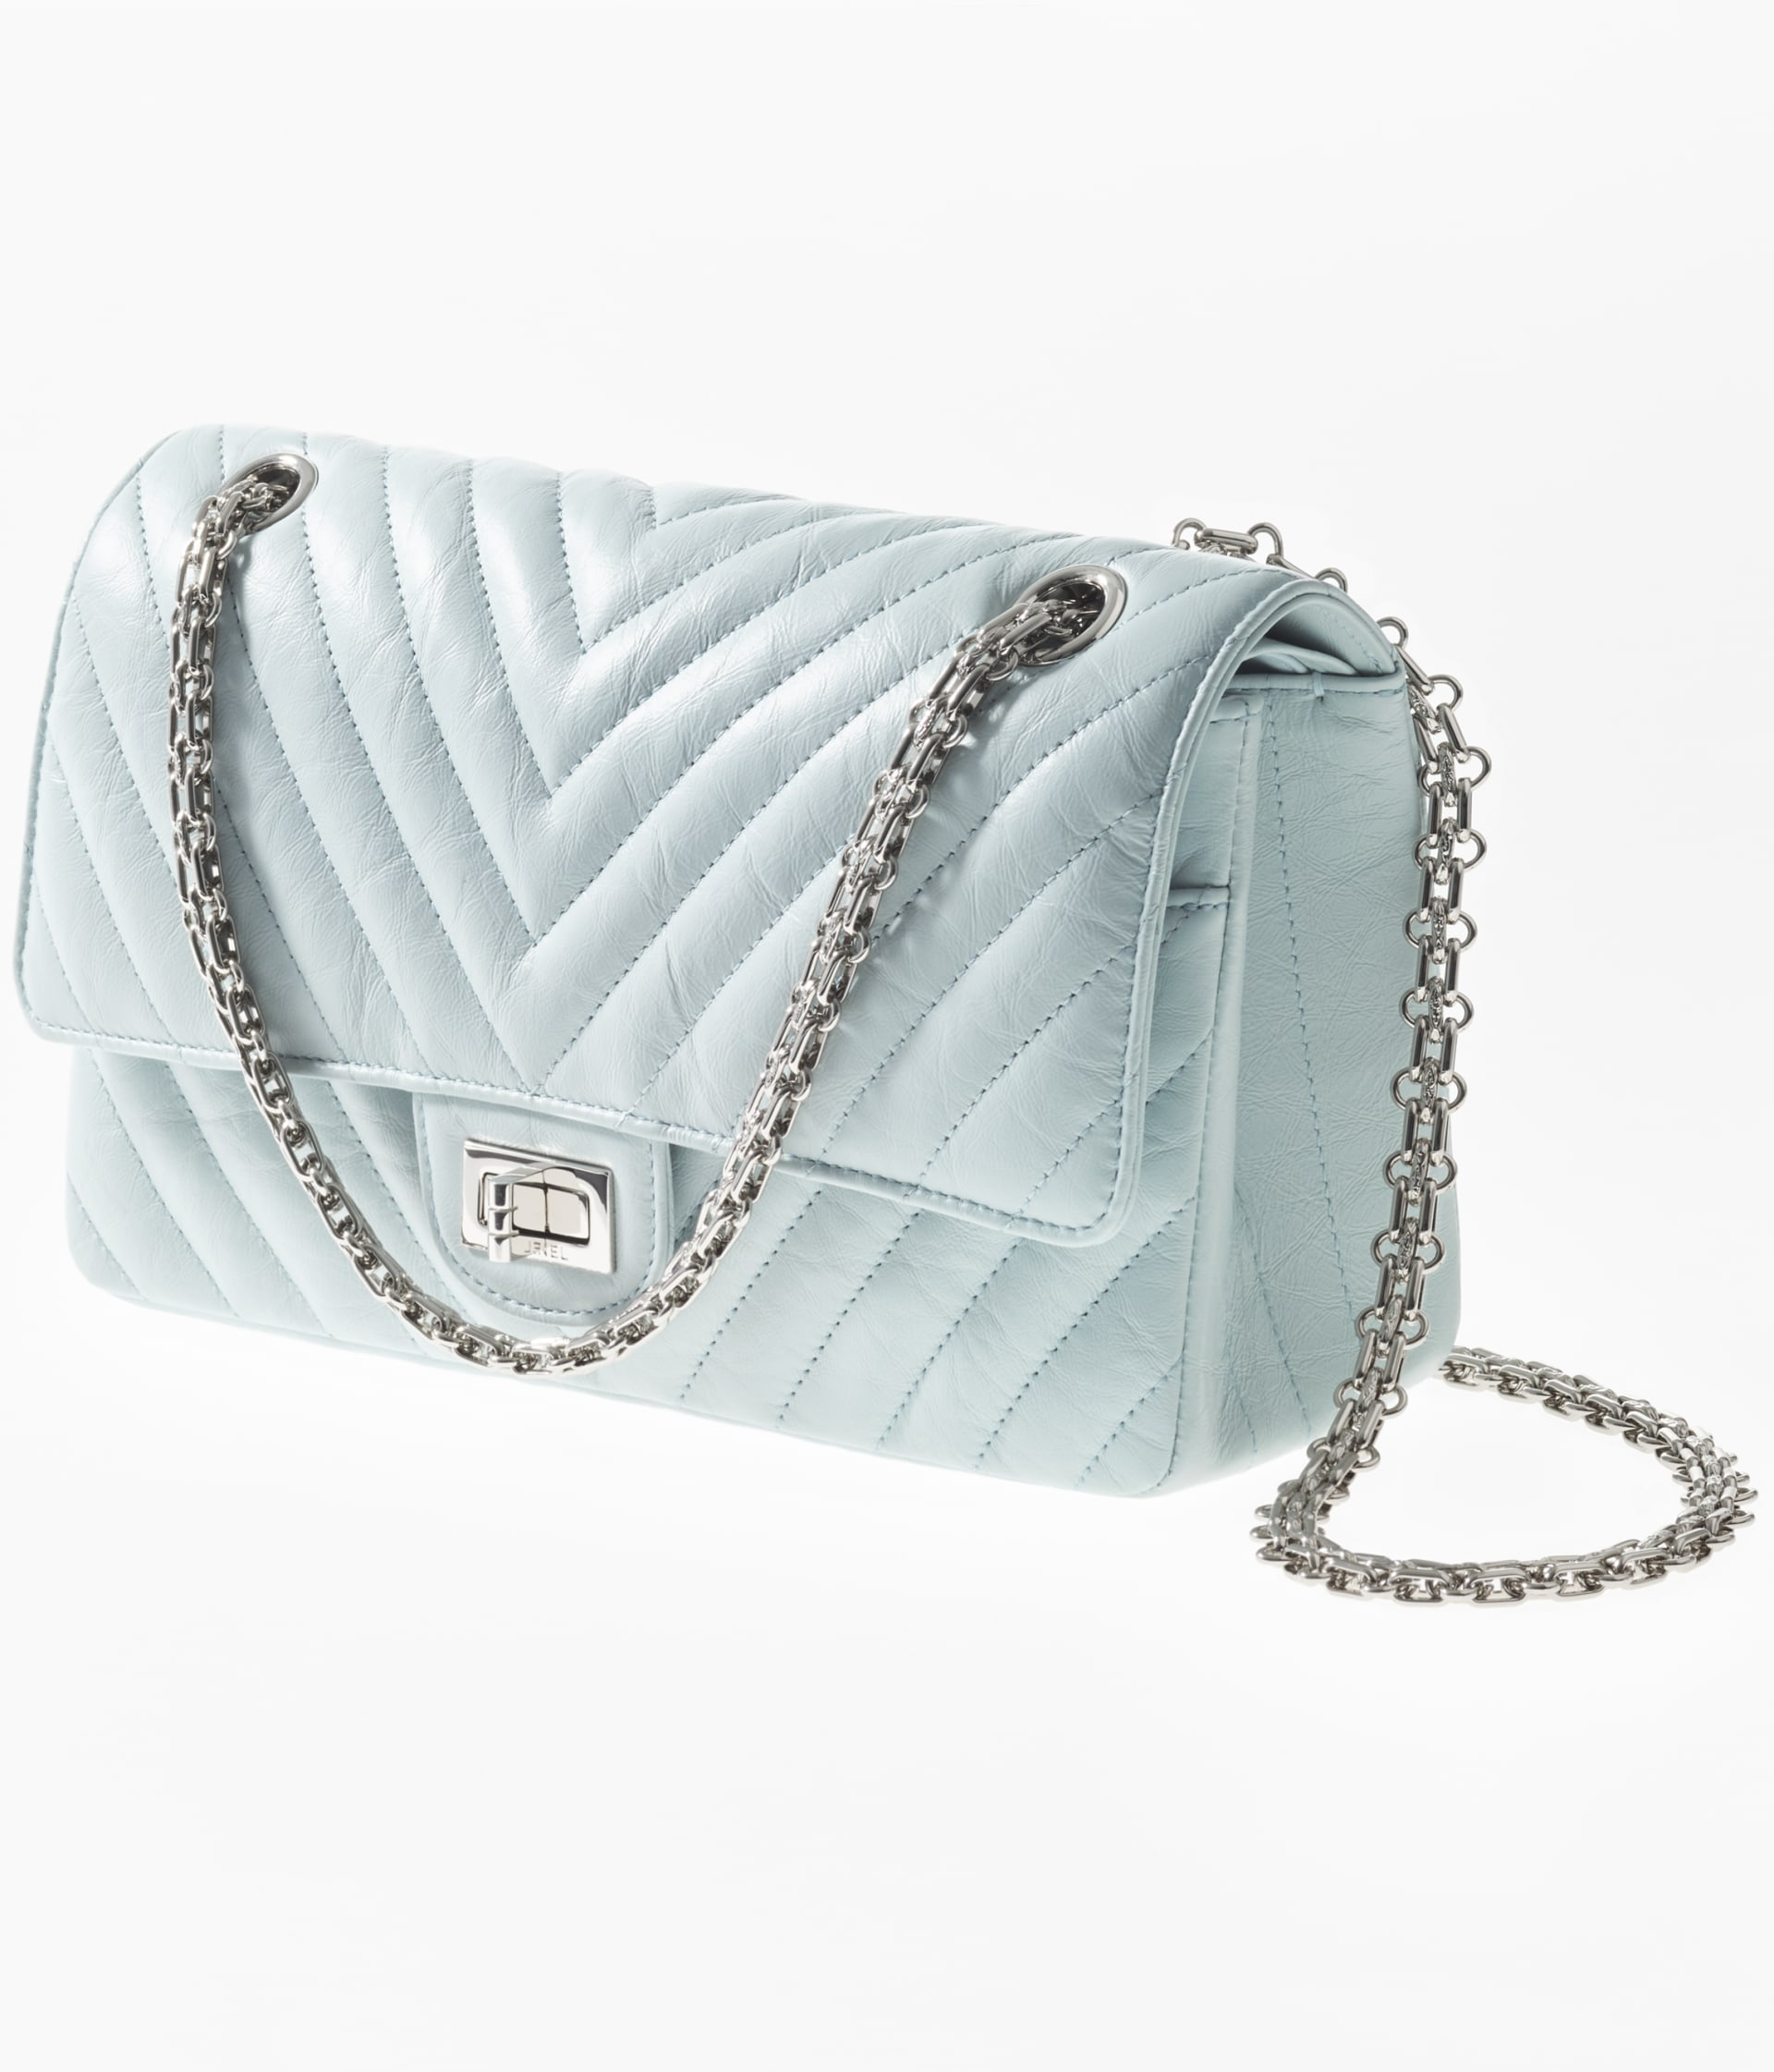 image 2 - 2.55 Handbag - Aged Calfskin & Silver-Tone Metal - Light Blue